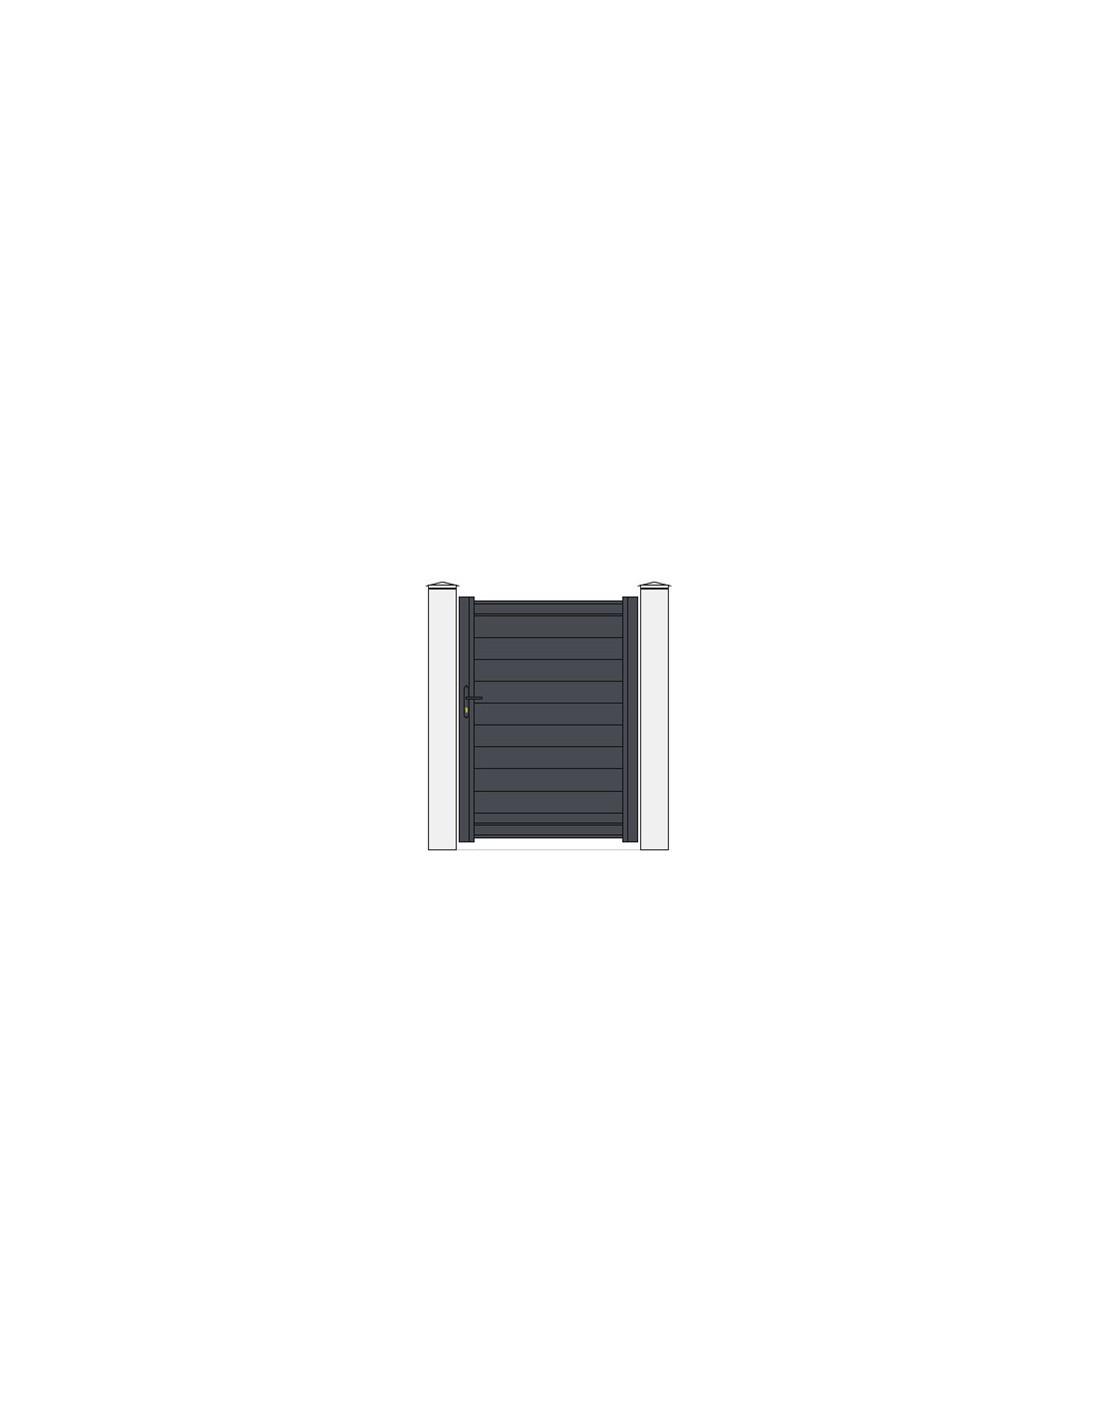 Portillon aluminium mod le anael x droit plein for Portillon alu gris